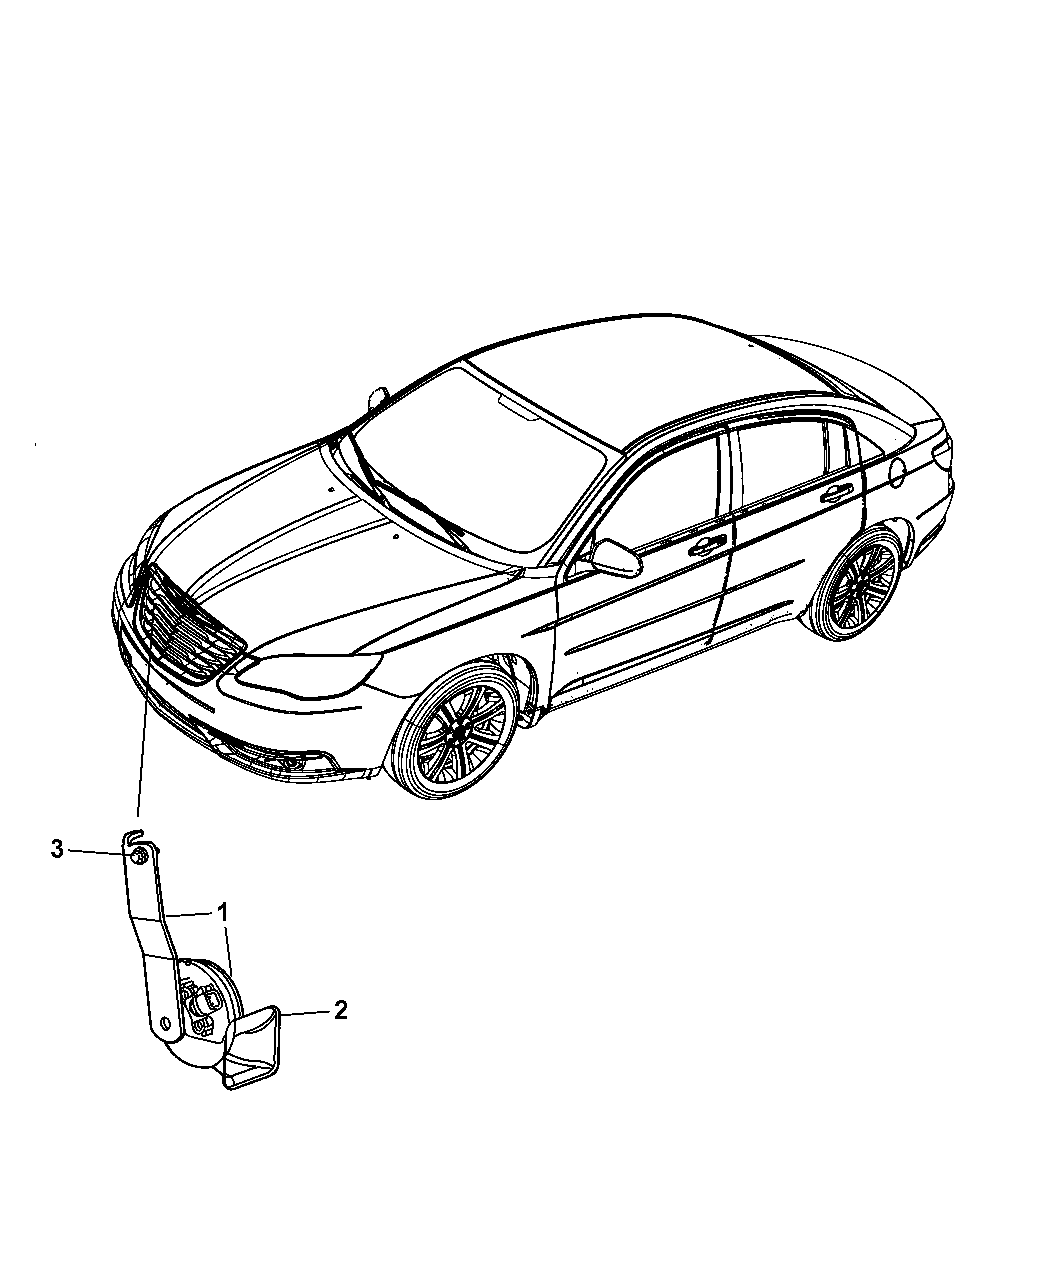 2013 Chrysler 200 Trailer Wiring Wiring Library